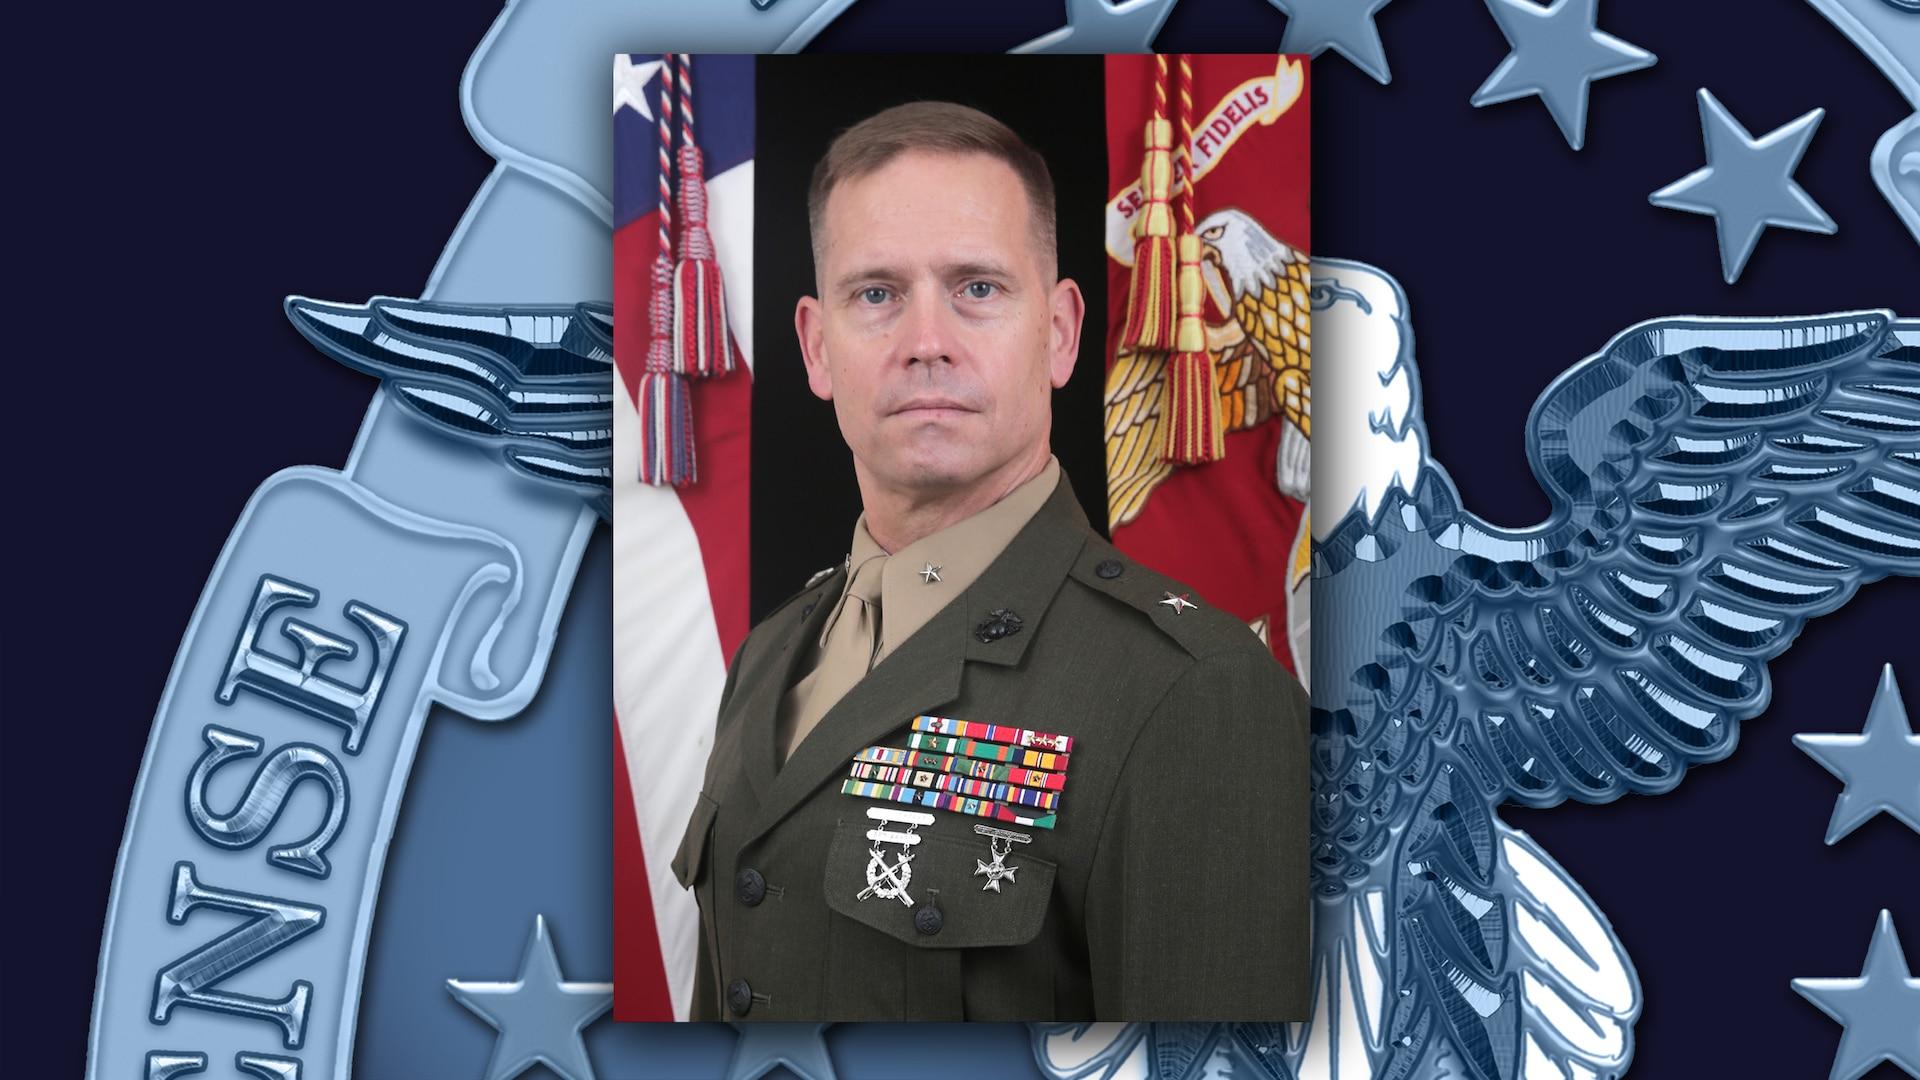 Marine Corps Brig. Gen. Keith D. Revntlow